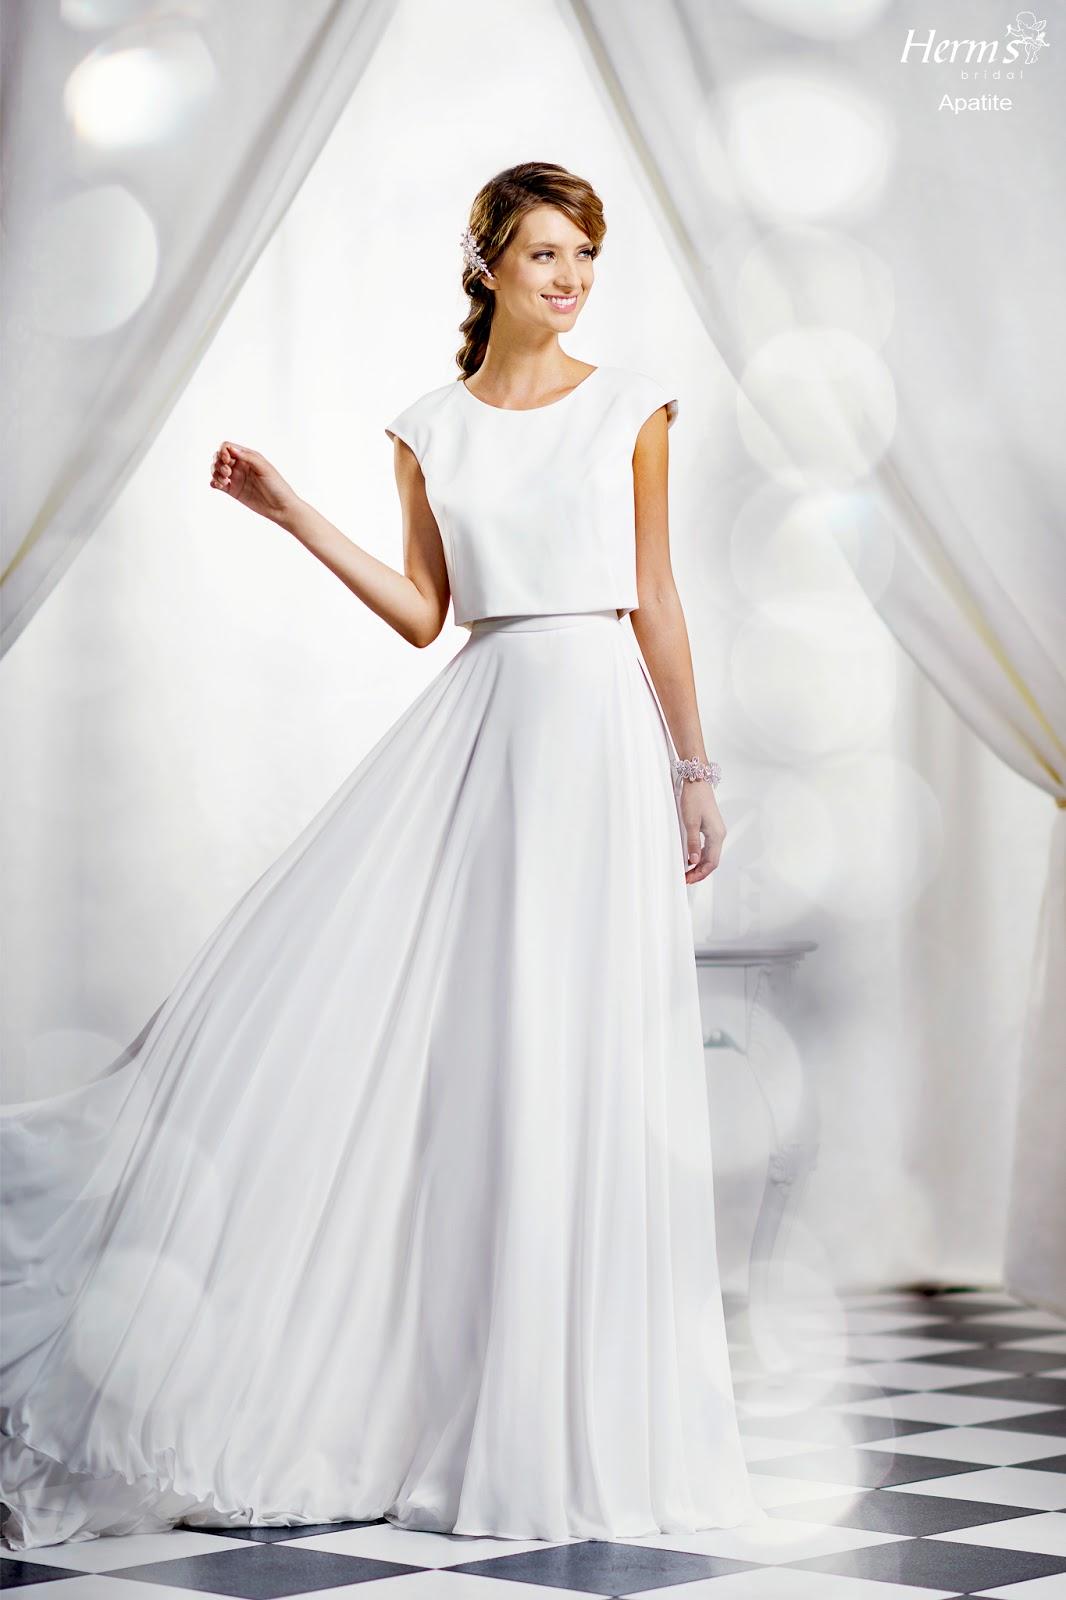 f3ad12ae5b67 Νυφικό Herm s bridal 2017 μεταξωτή μουσελίνα (φούστα και crop top)